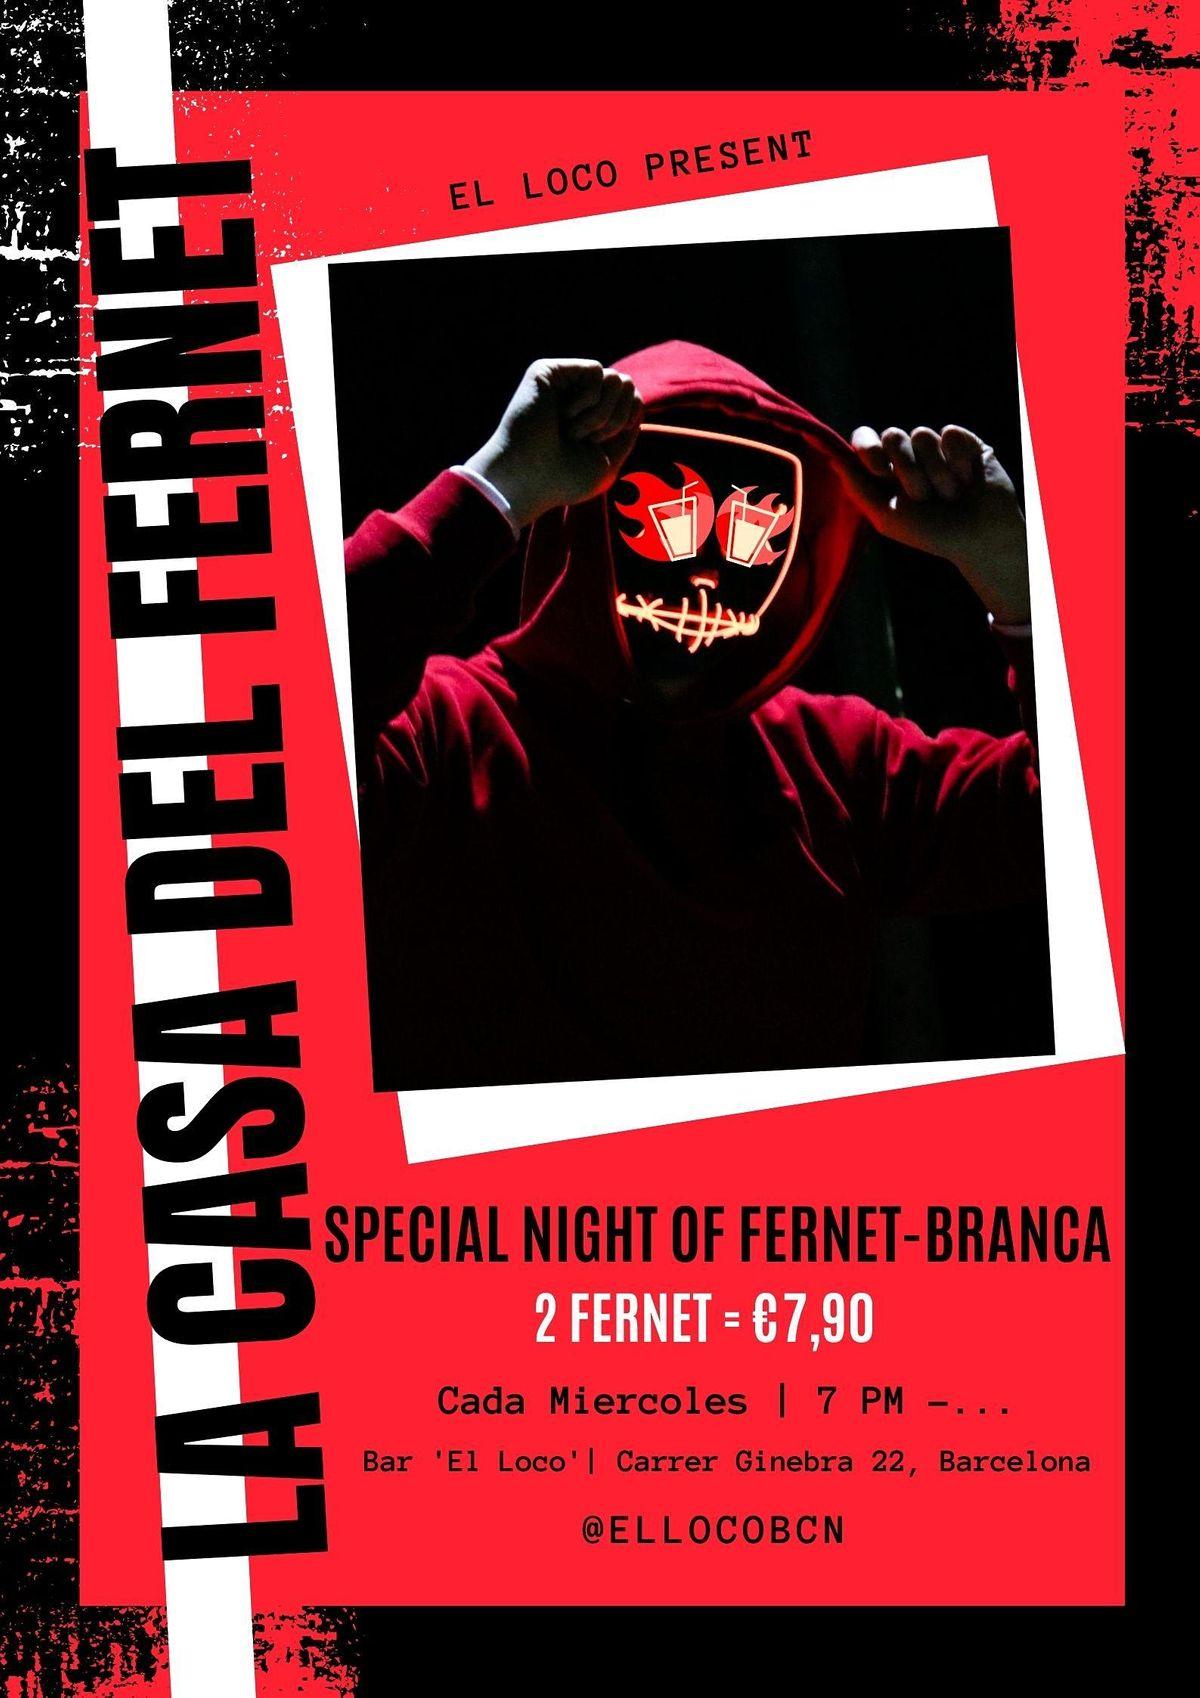 La casa de Fernet-Branca   Event in Barcelona   AllEvents.in